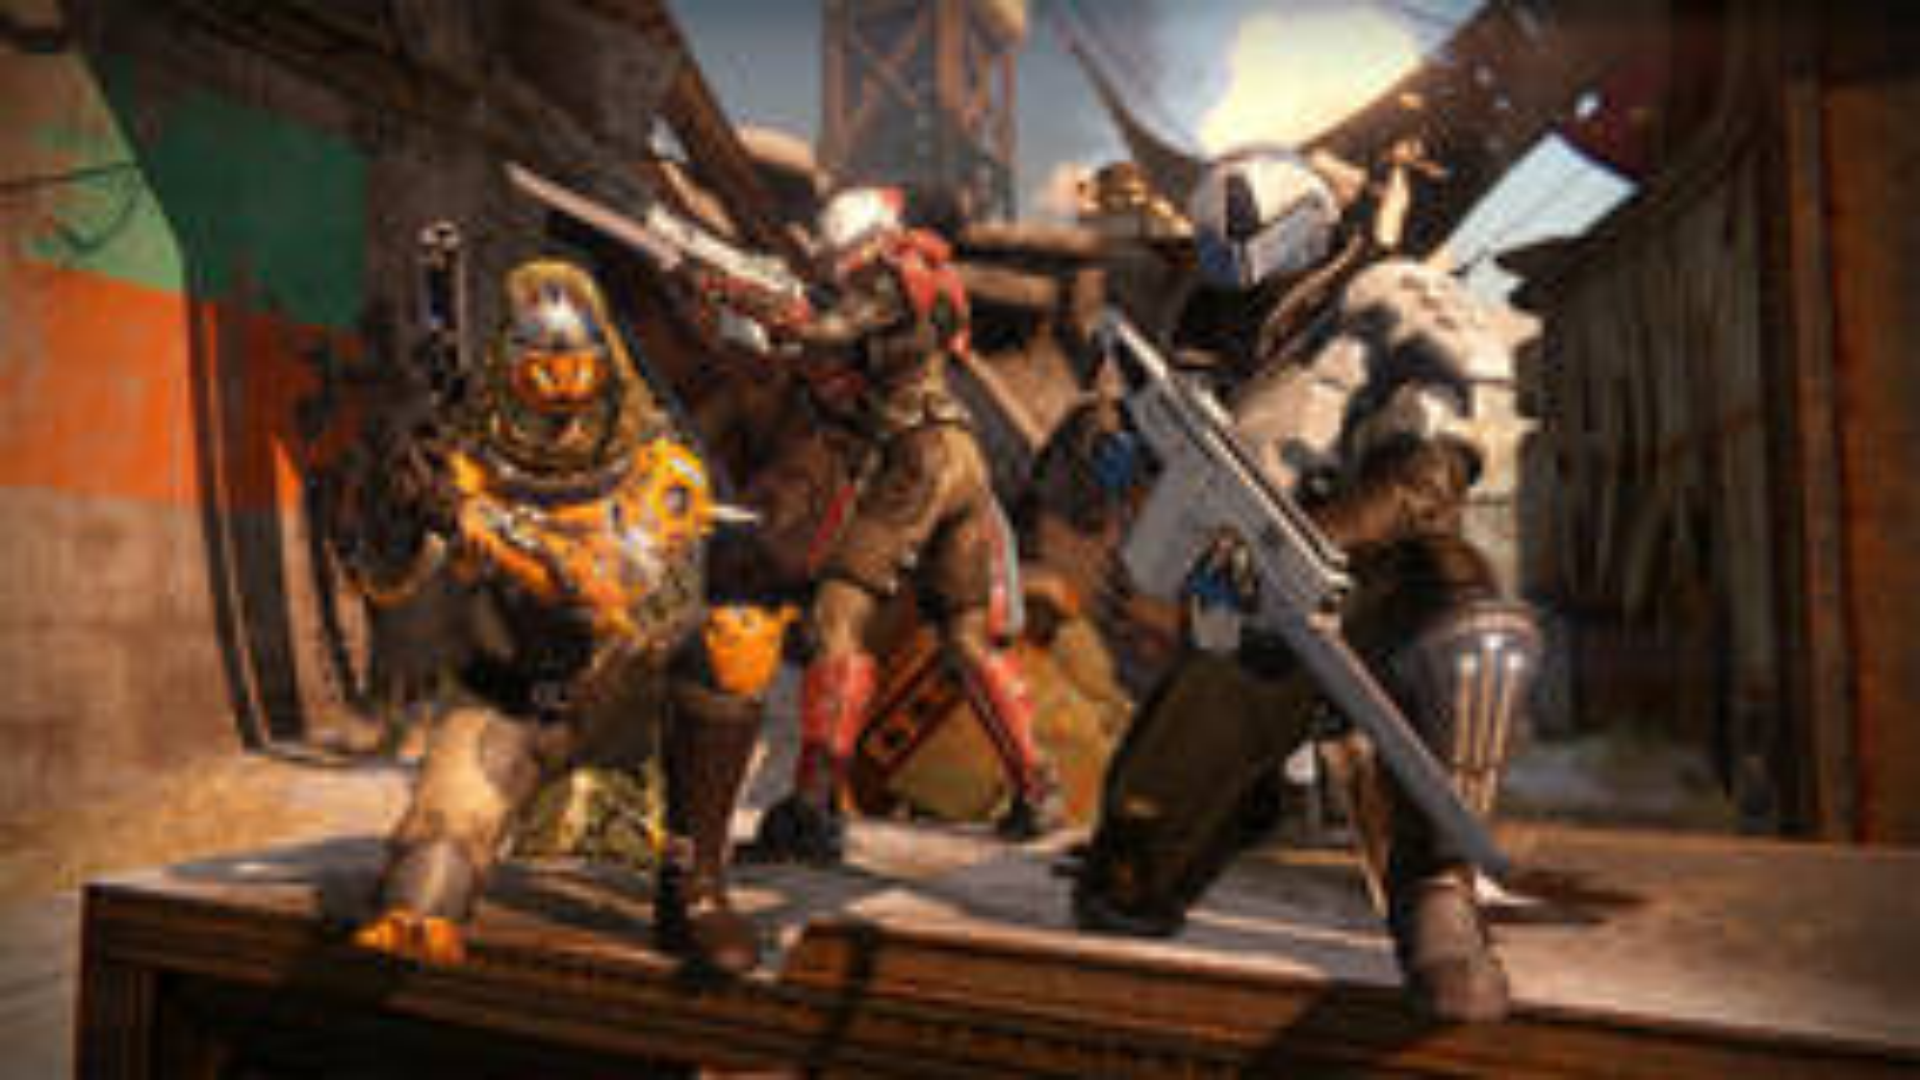 Image for Destiny beta tips: all secrets, Hunter, Titan, Warlock class guide